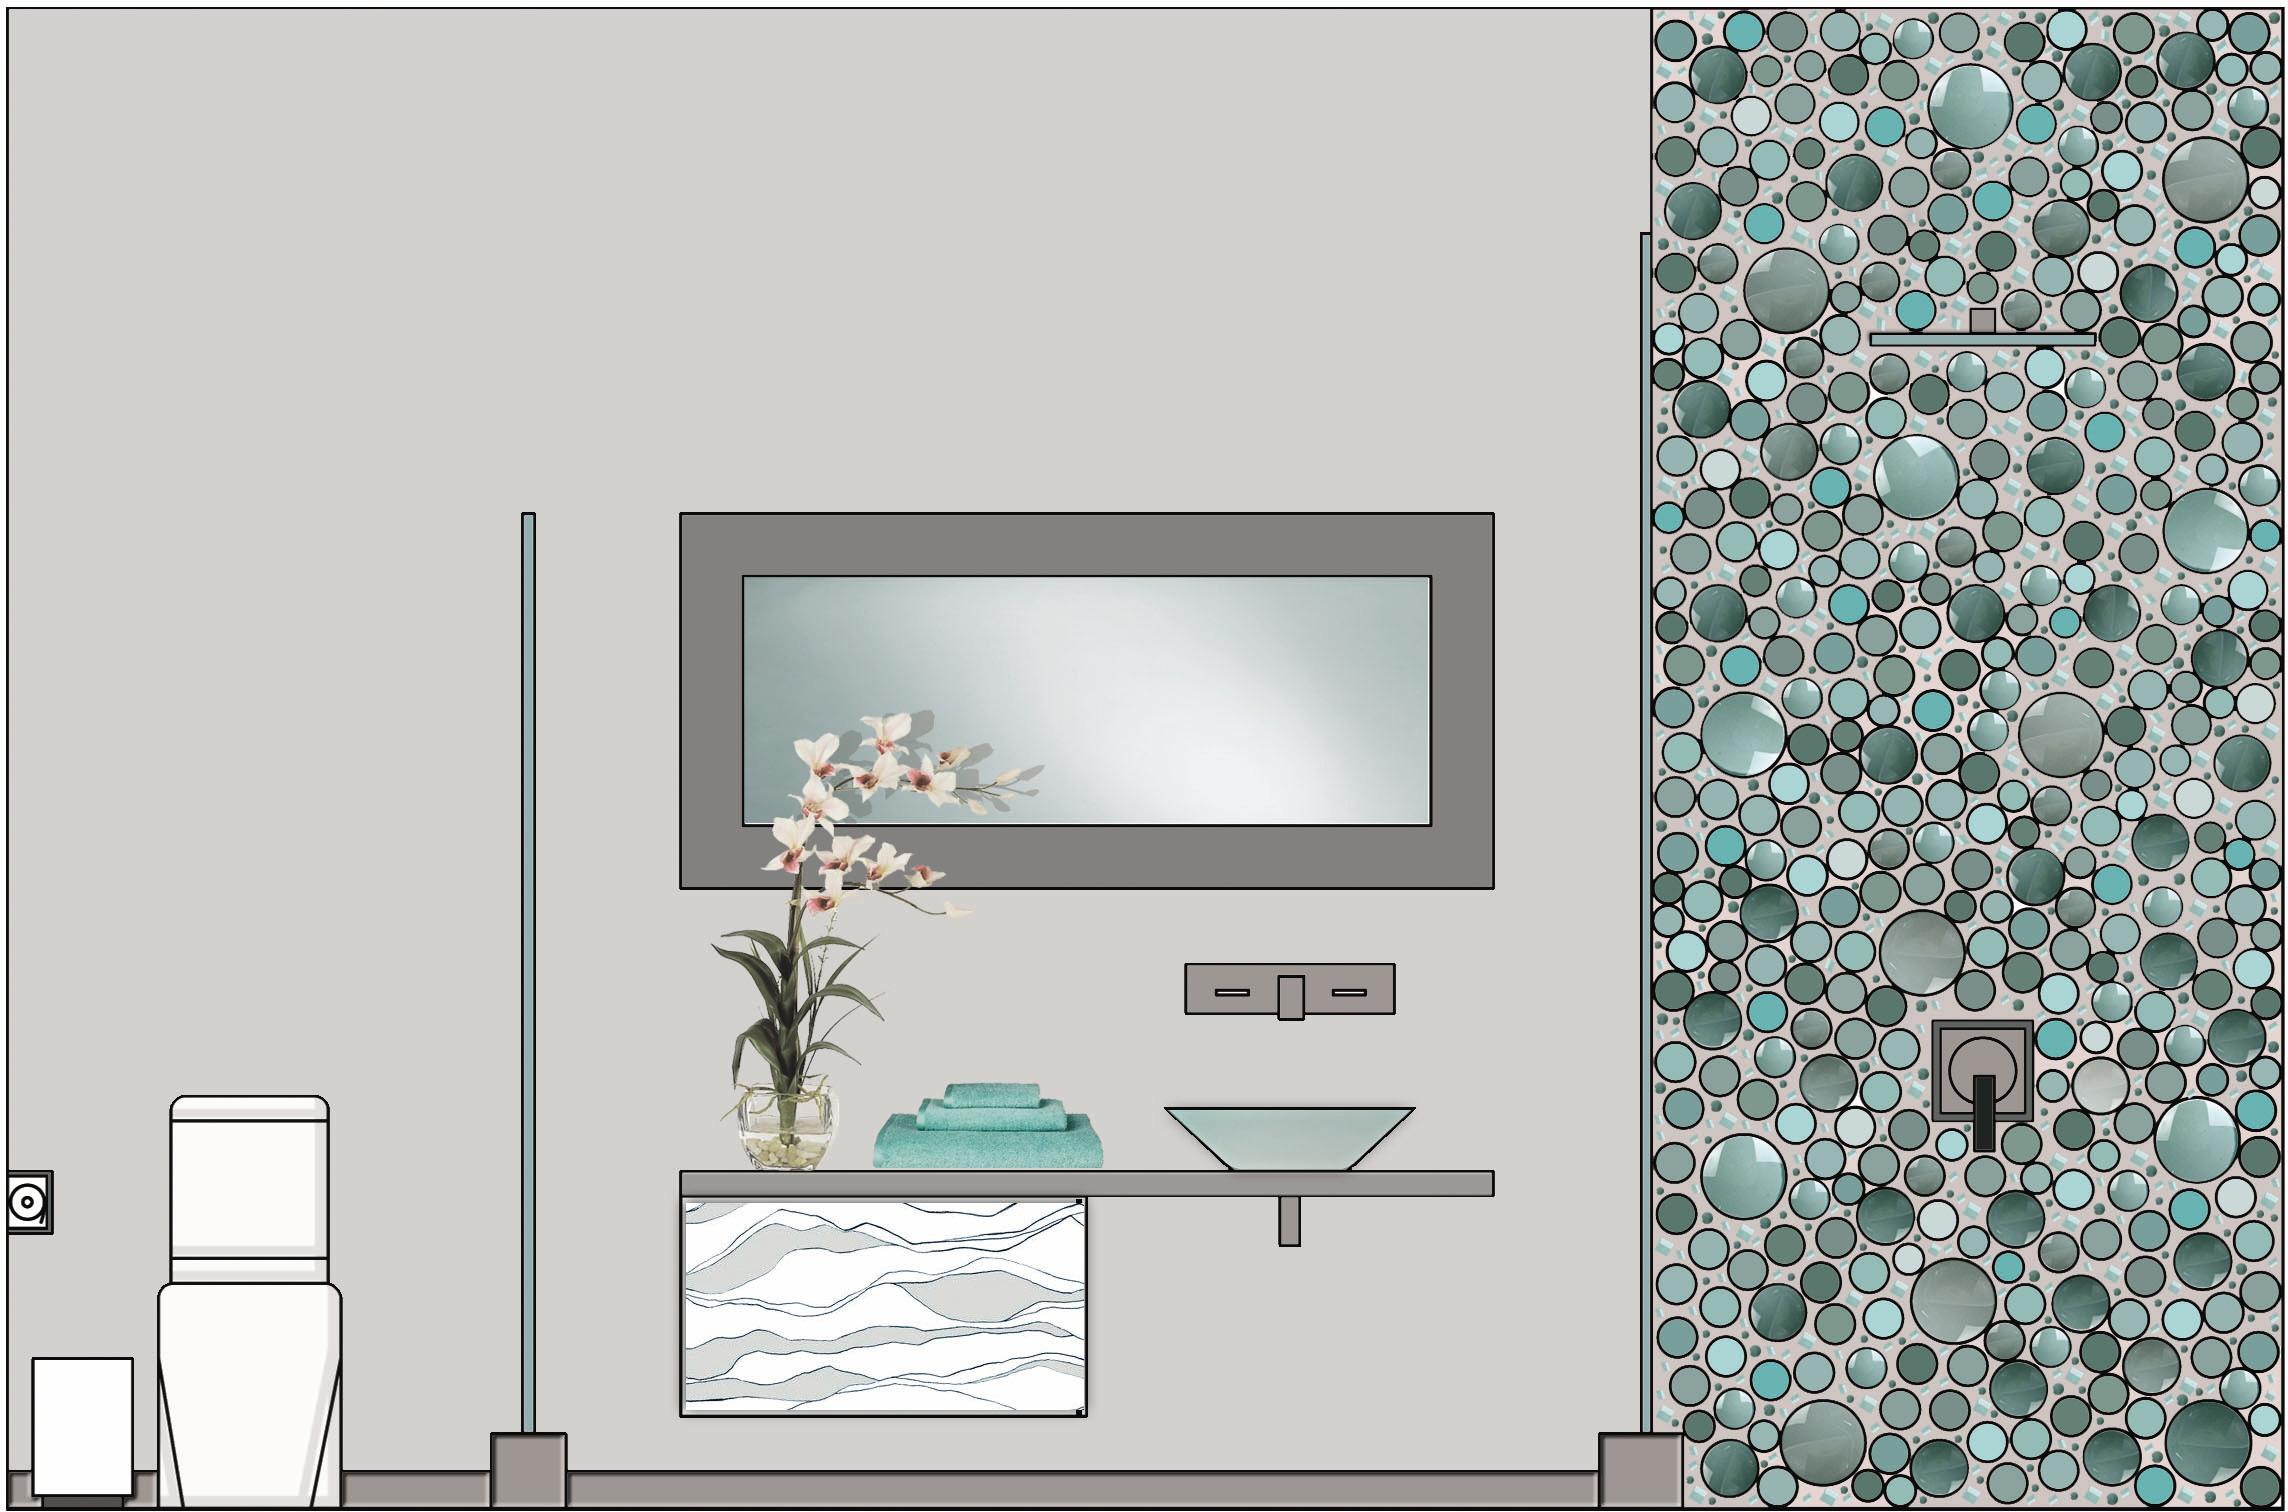 Front Elevation Of Bathroom : Project a dzhugaryan residence by knarik serobyan at